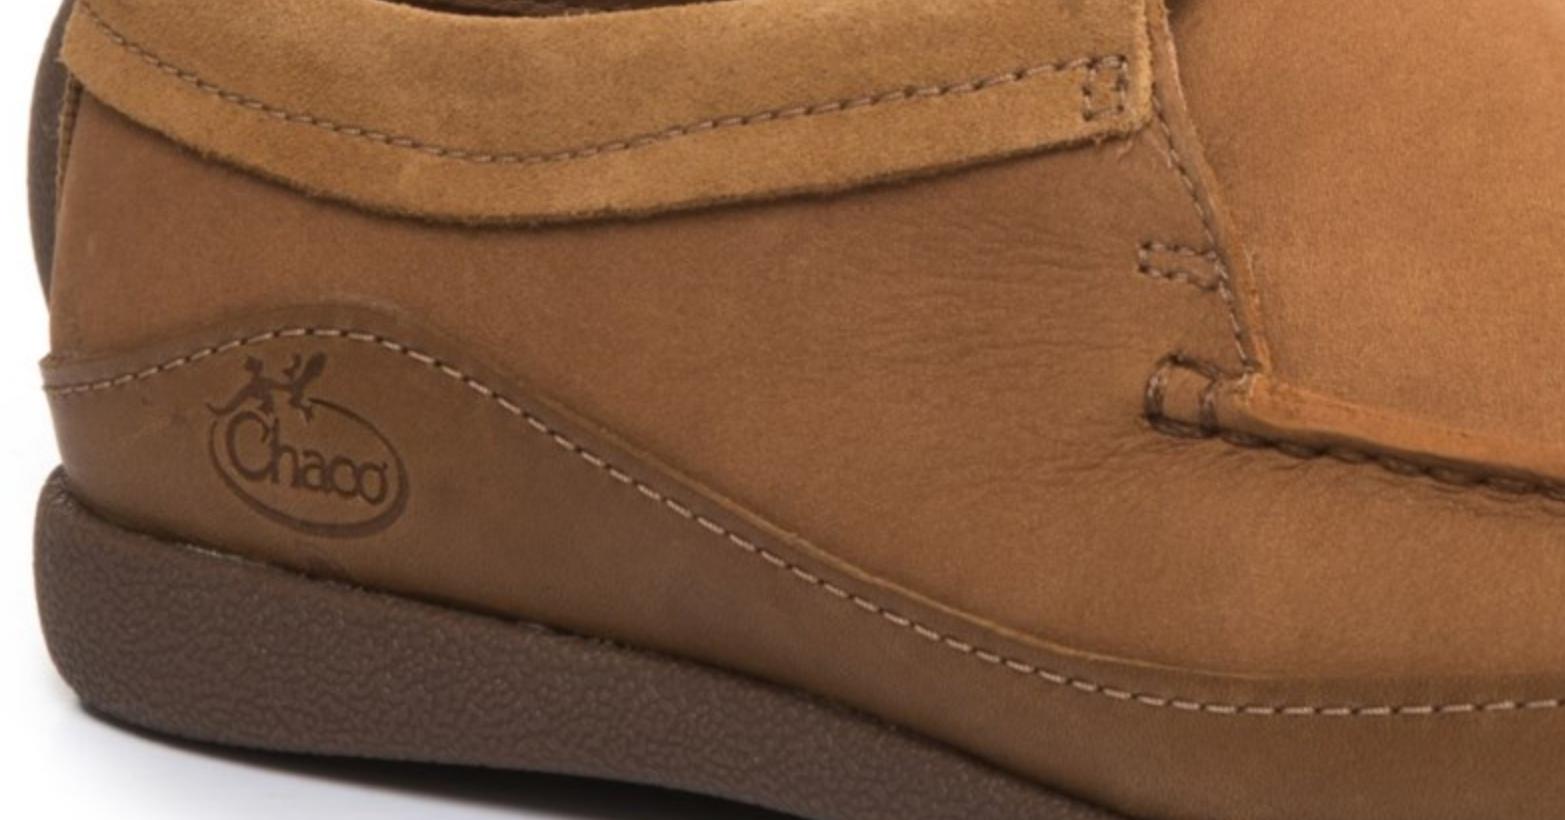 Nuevos Zapatos Para Chaco PINELAND mocasín Para Zapatos Mujer 10.5 J1058 envío gratis cfb409